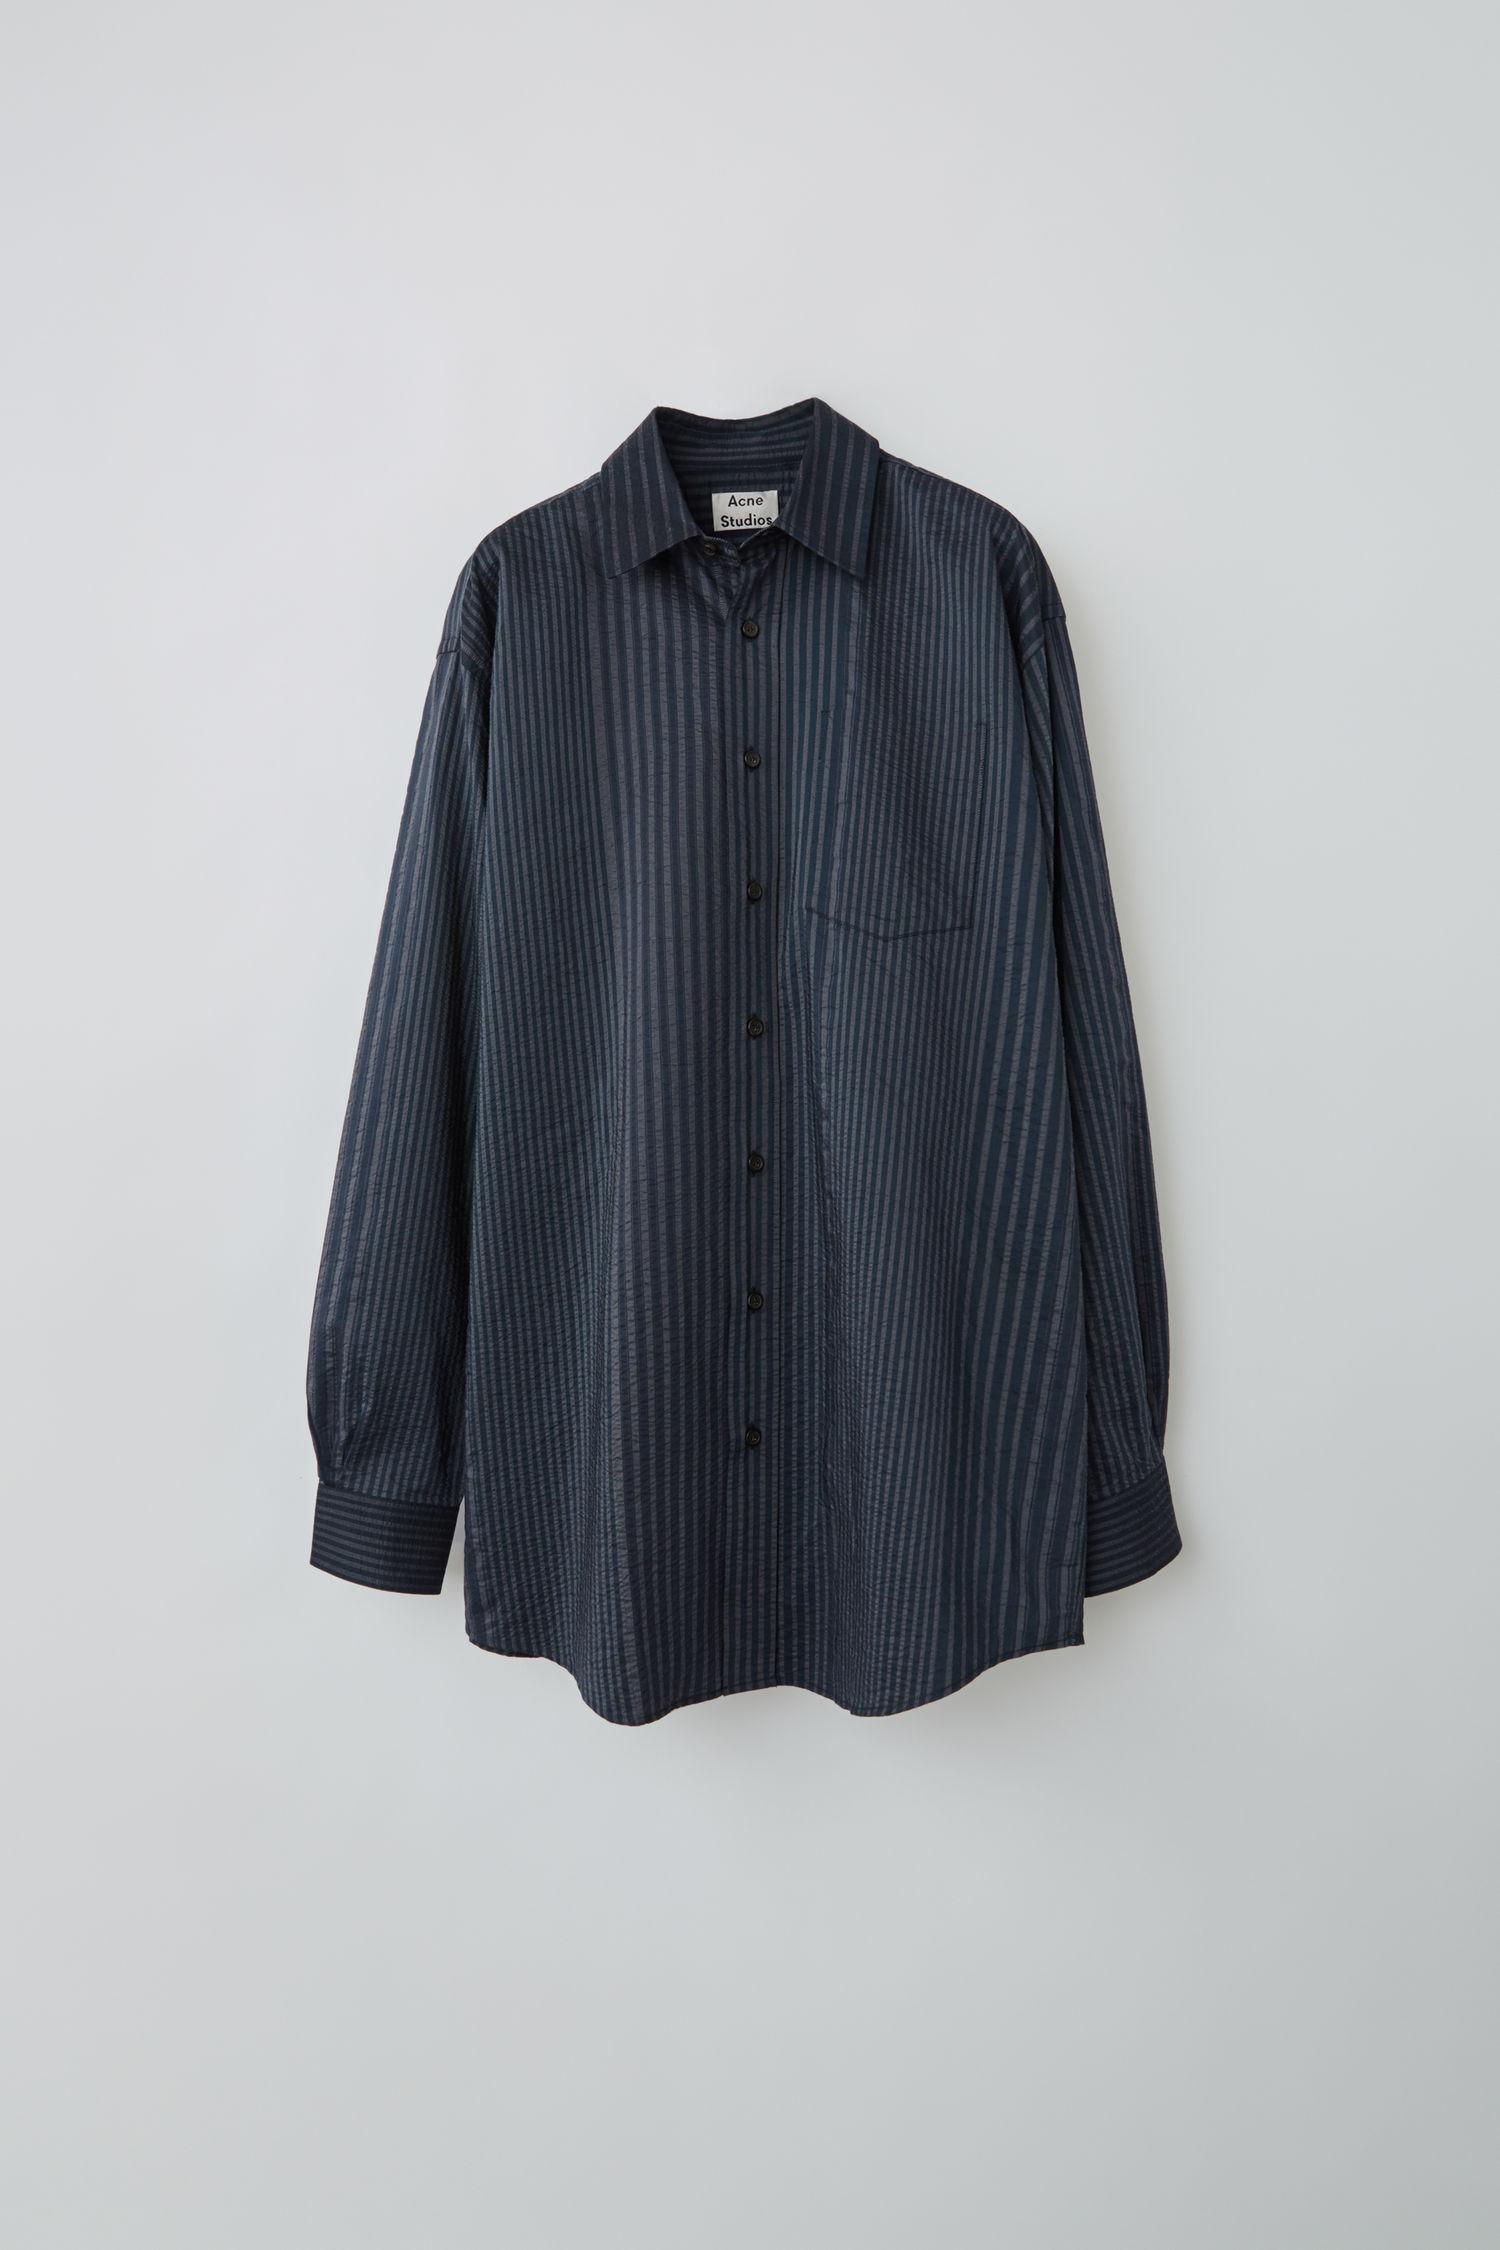 acne_studios_Oversized_striped_shirt_navy_grey_1.jpg